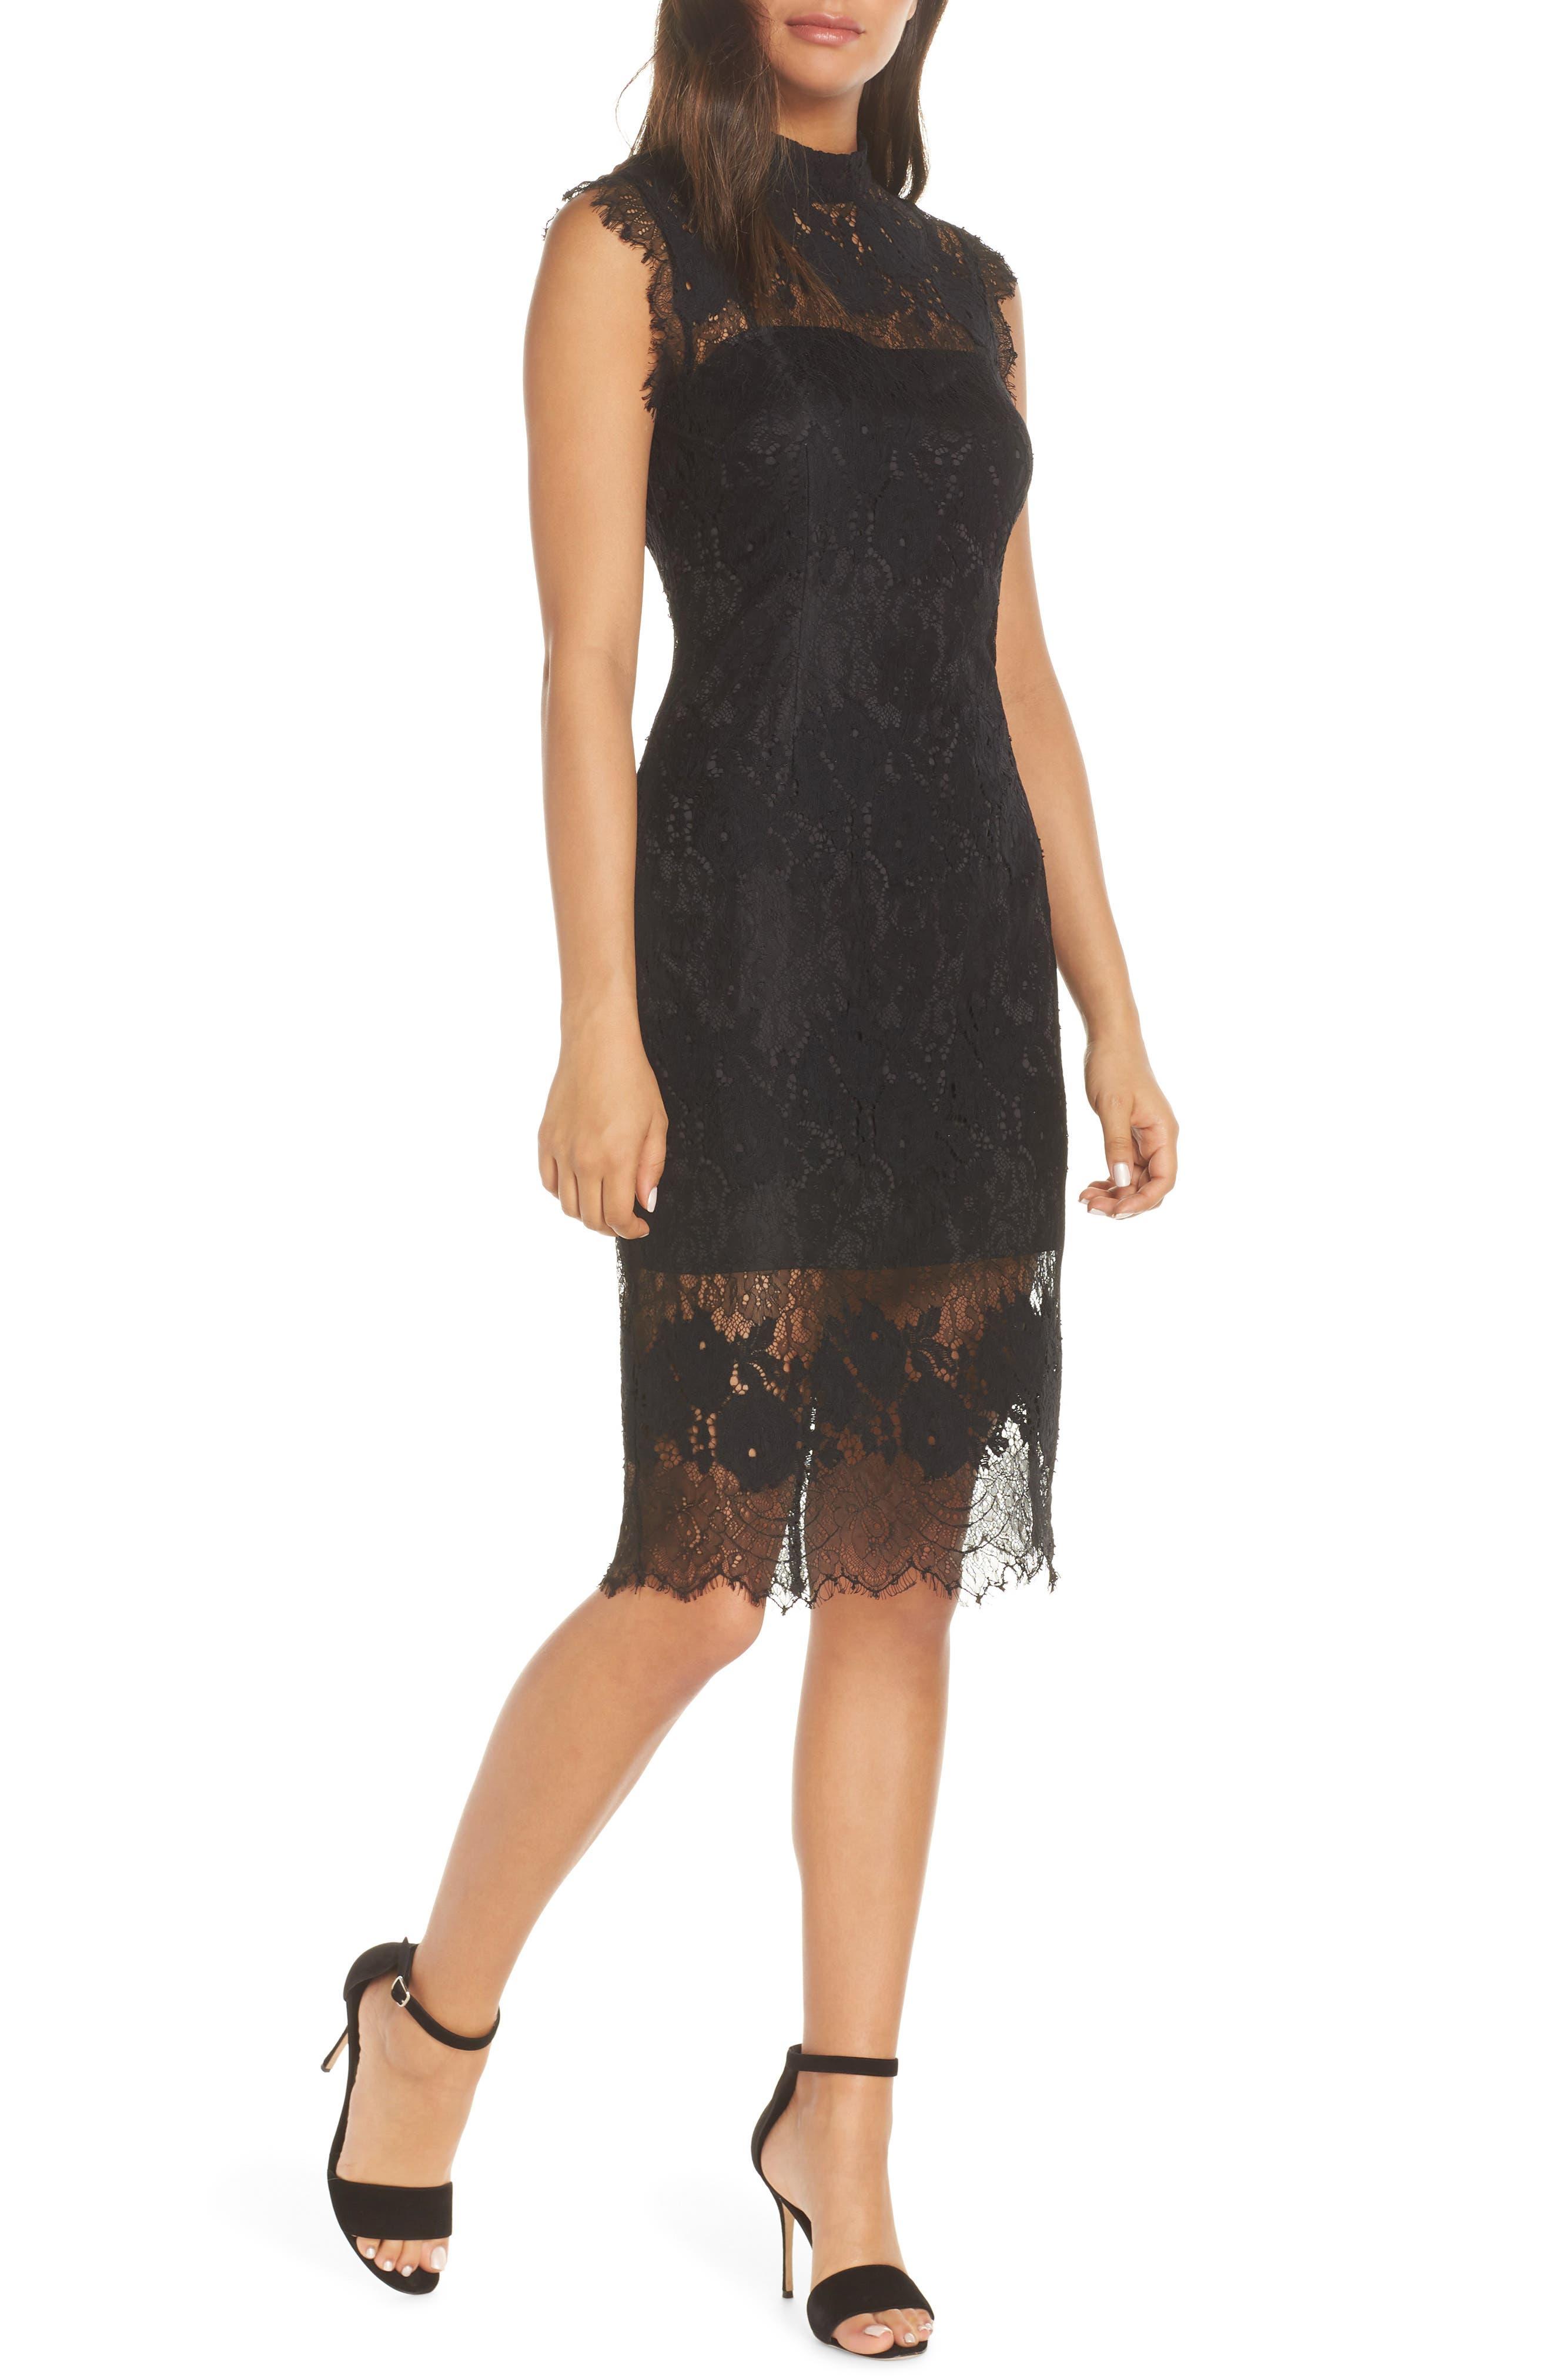 ADELYN RAE Naila Mock Neck Lace Dress in Black